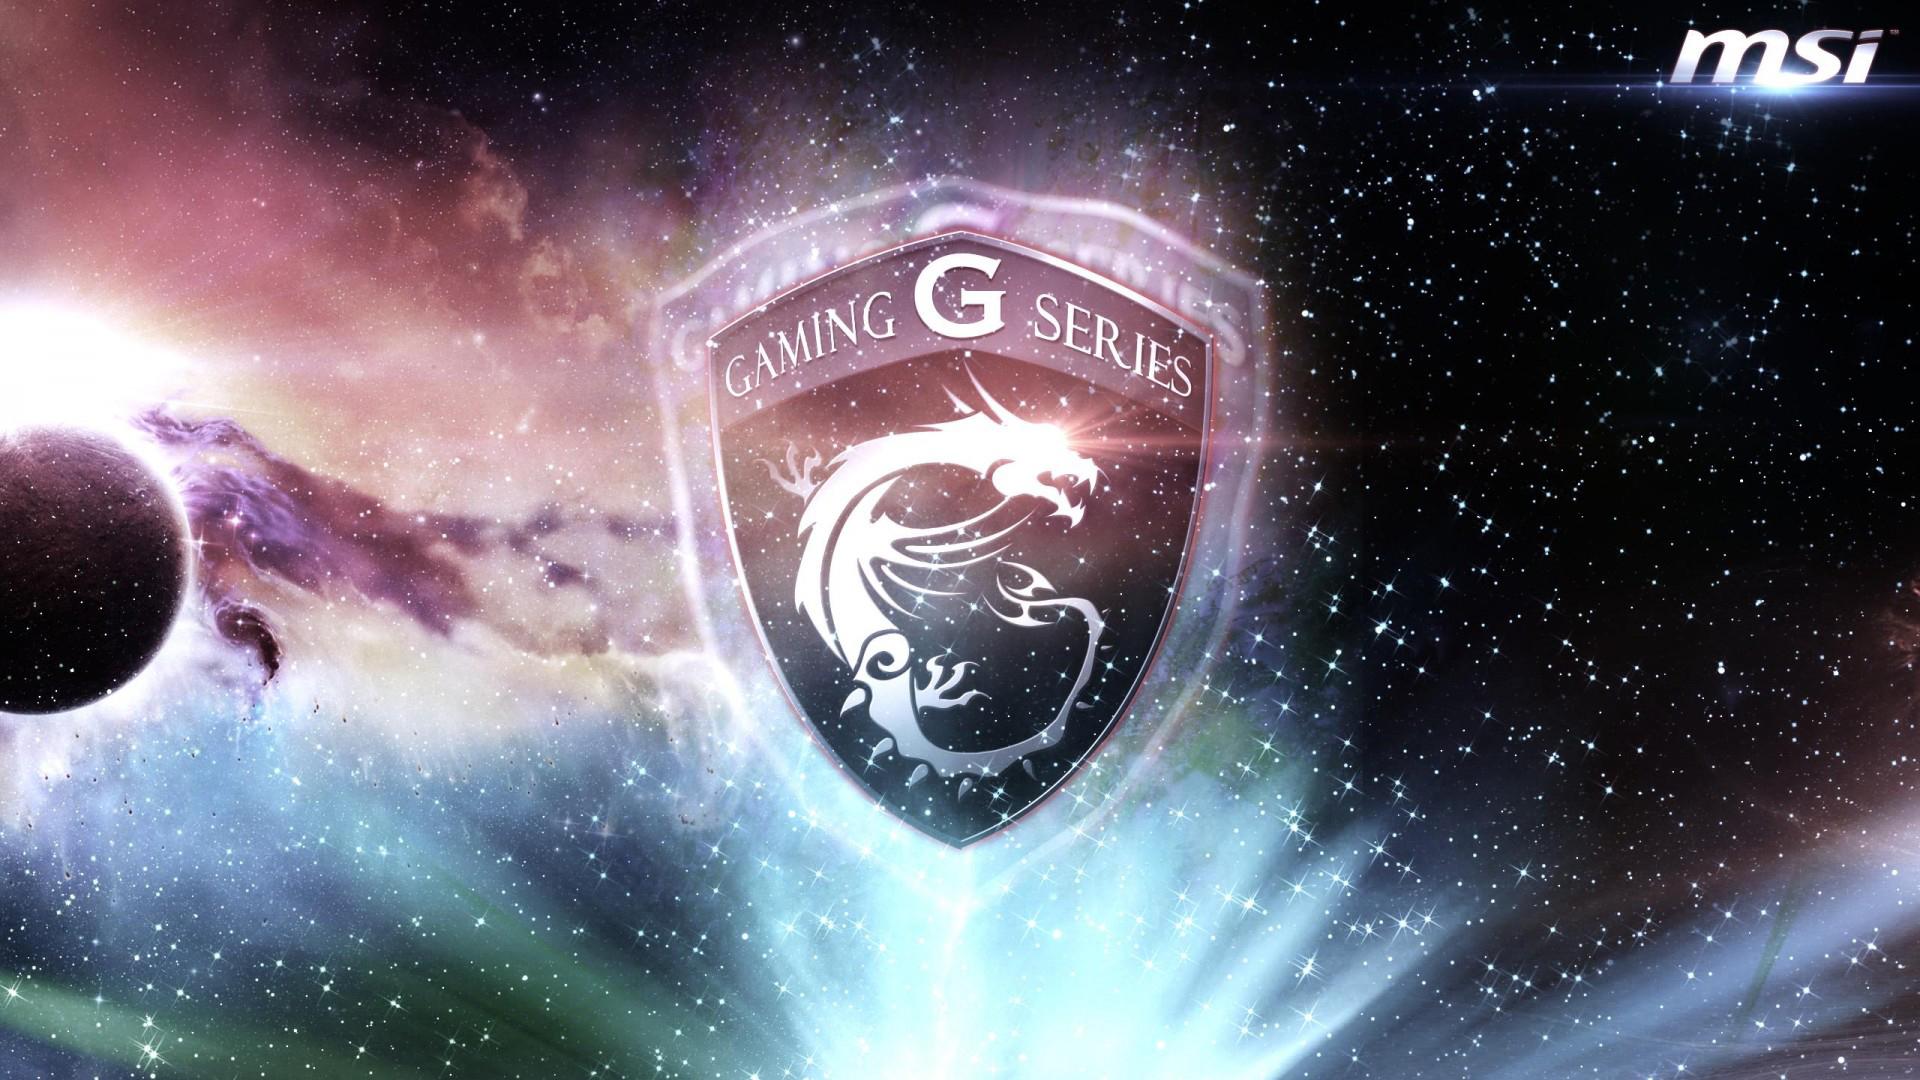 Msi logo g series 04 wallpaper hd msi gaming g series dragon logo hd voltagebd Gallery